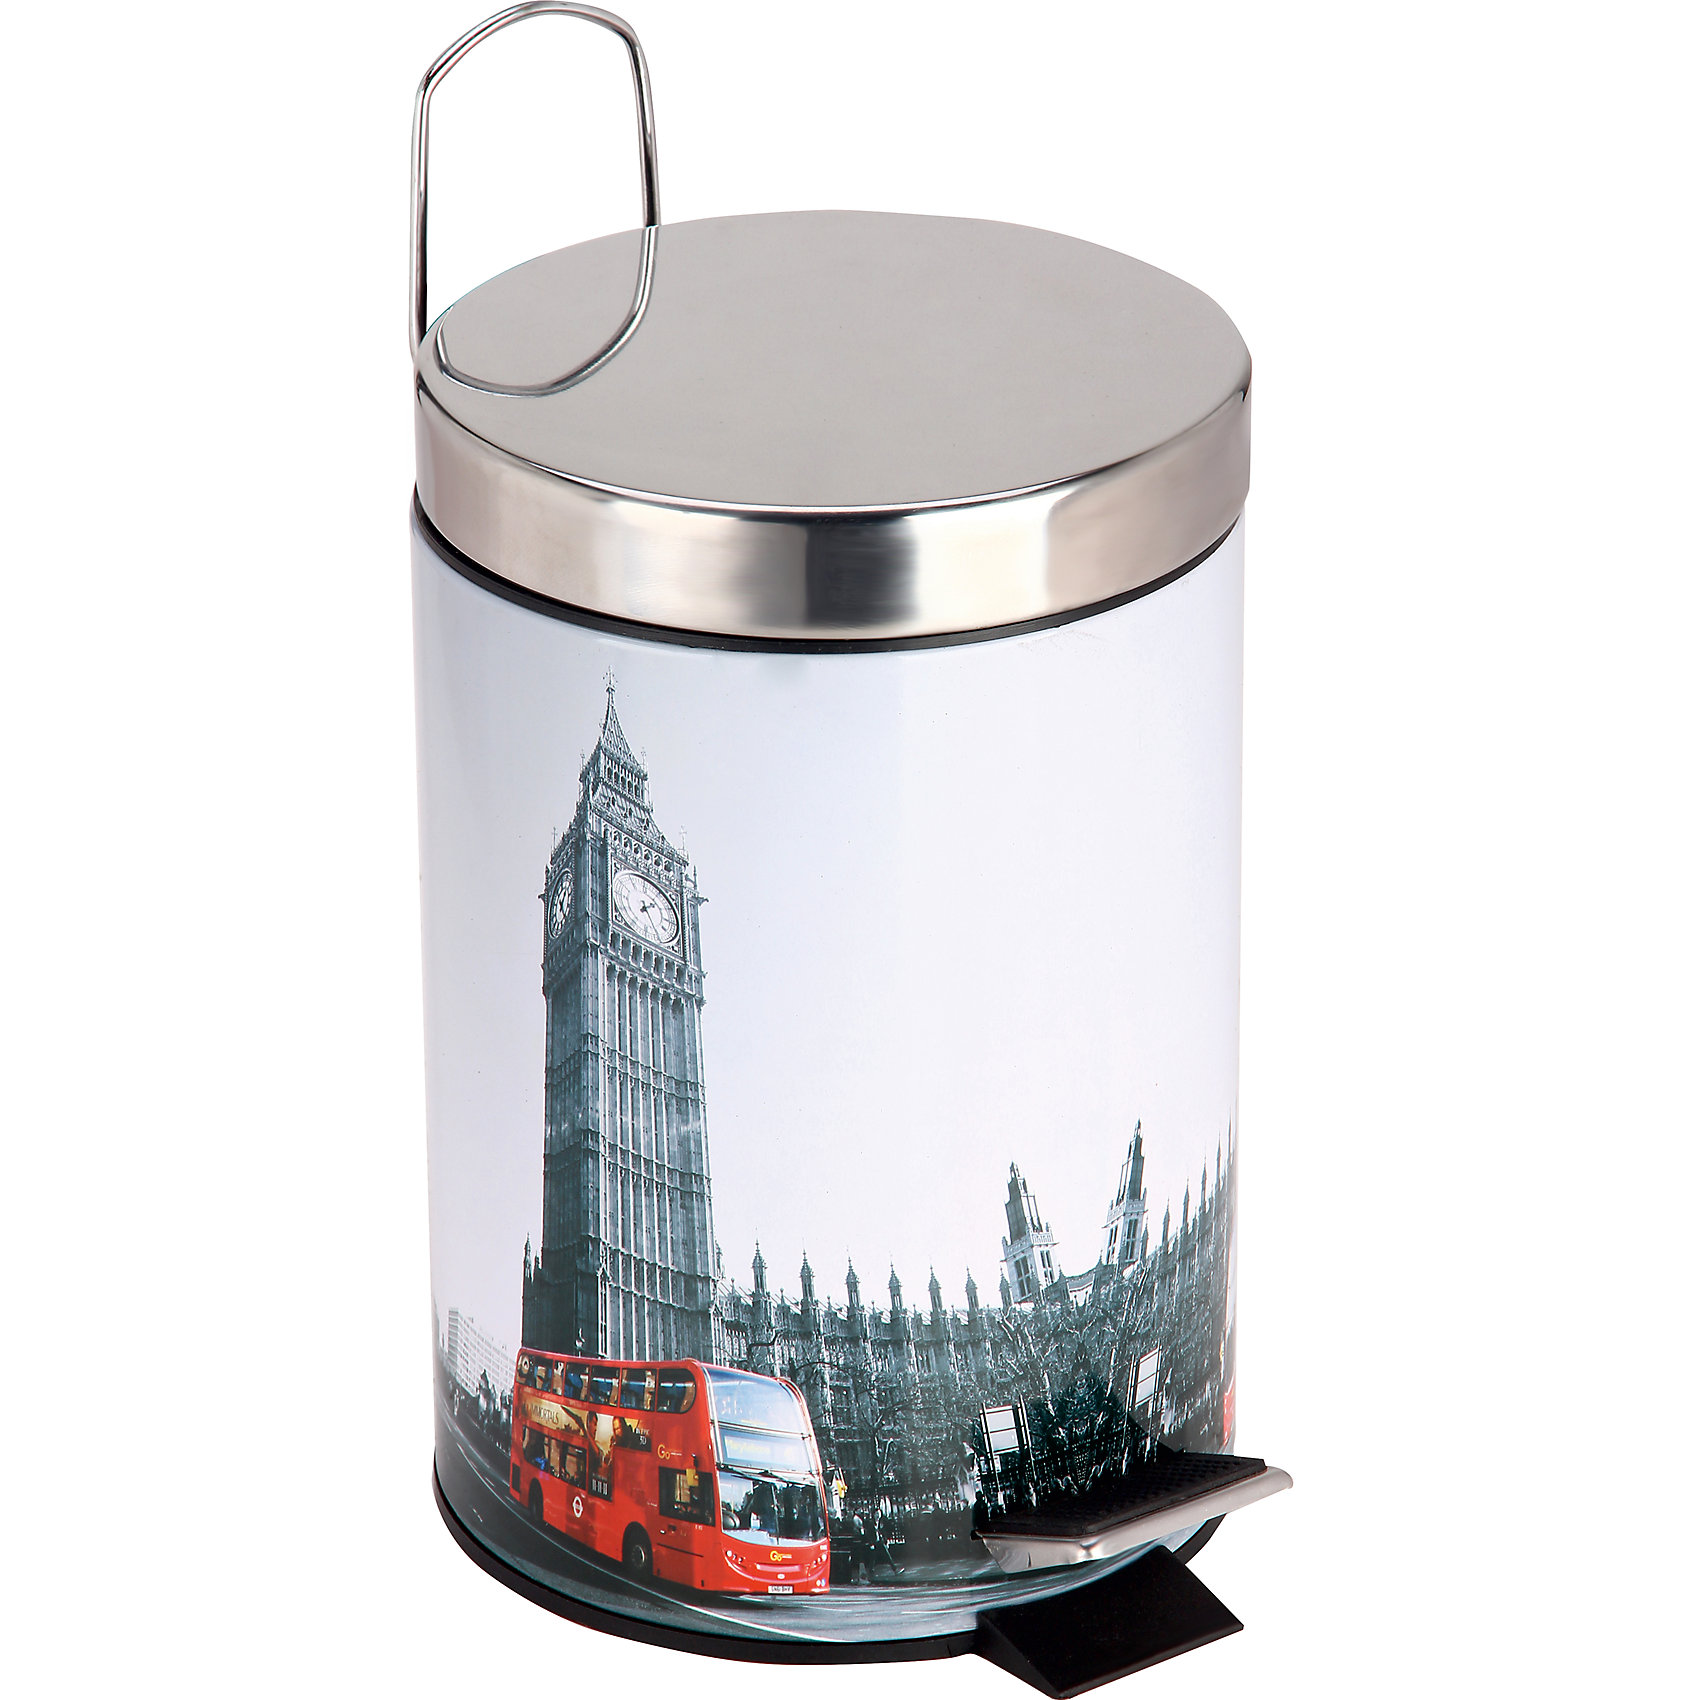 Ведро для мусора круглое DB-21 Лондон 3л, Рыжий котПорядок в детской<br>Ведро для мусора круглое DB-21 Лондон Объем: 3л<br><br>Ширина мм: 190<br>Глубина мм: 190<br>Высота мм: 260<br>Вес г: 853<br>Возраст от месяцев: 216<br>Возраст до месяцев: 1188<br>Пол: Унисекс<br>Возраст: Детский<br>SKU: 4288536